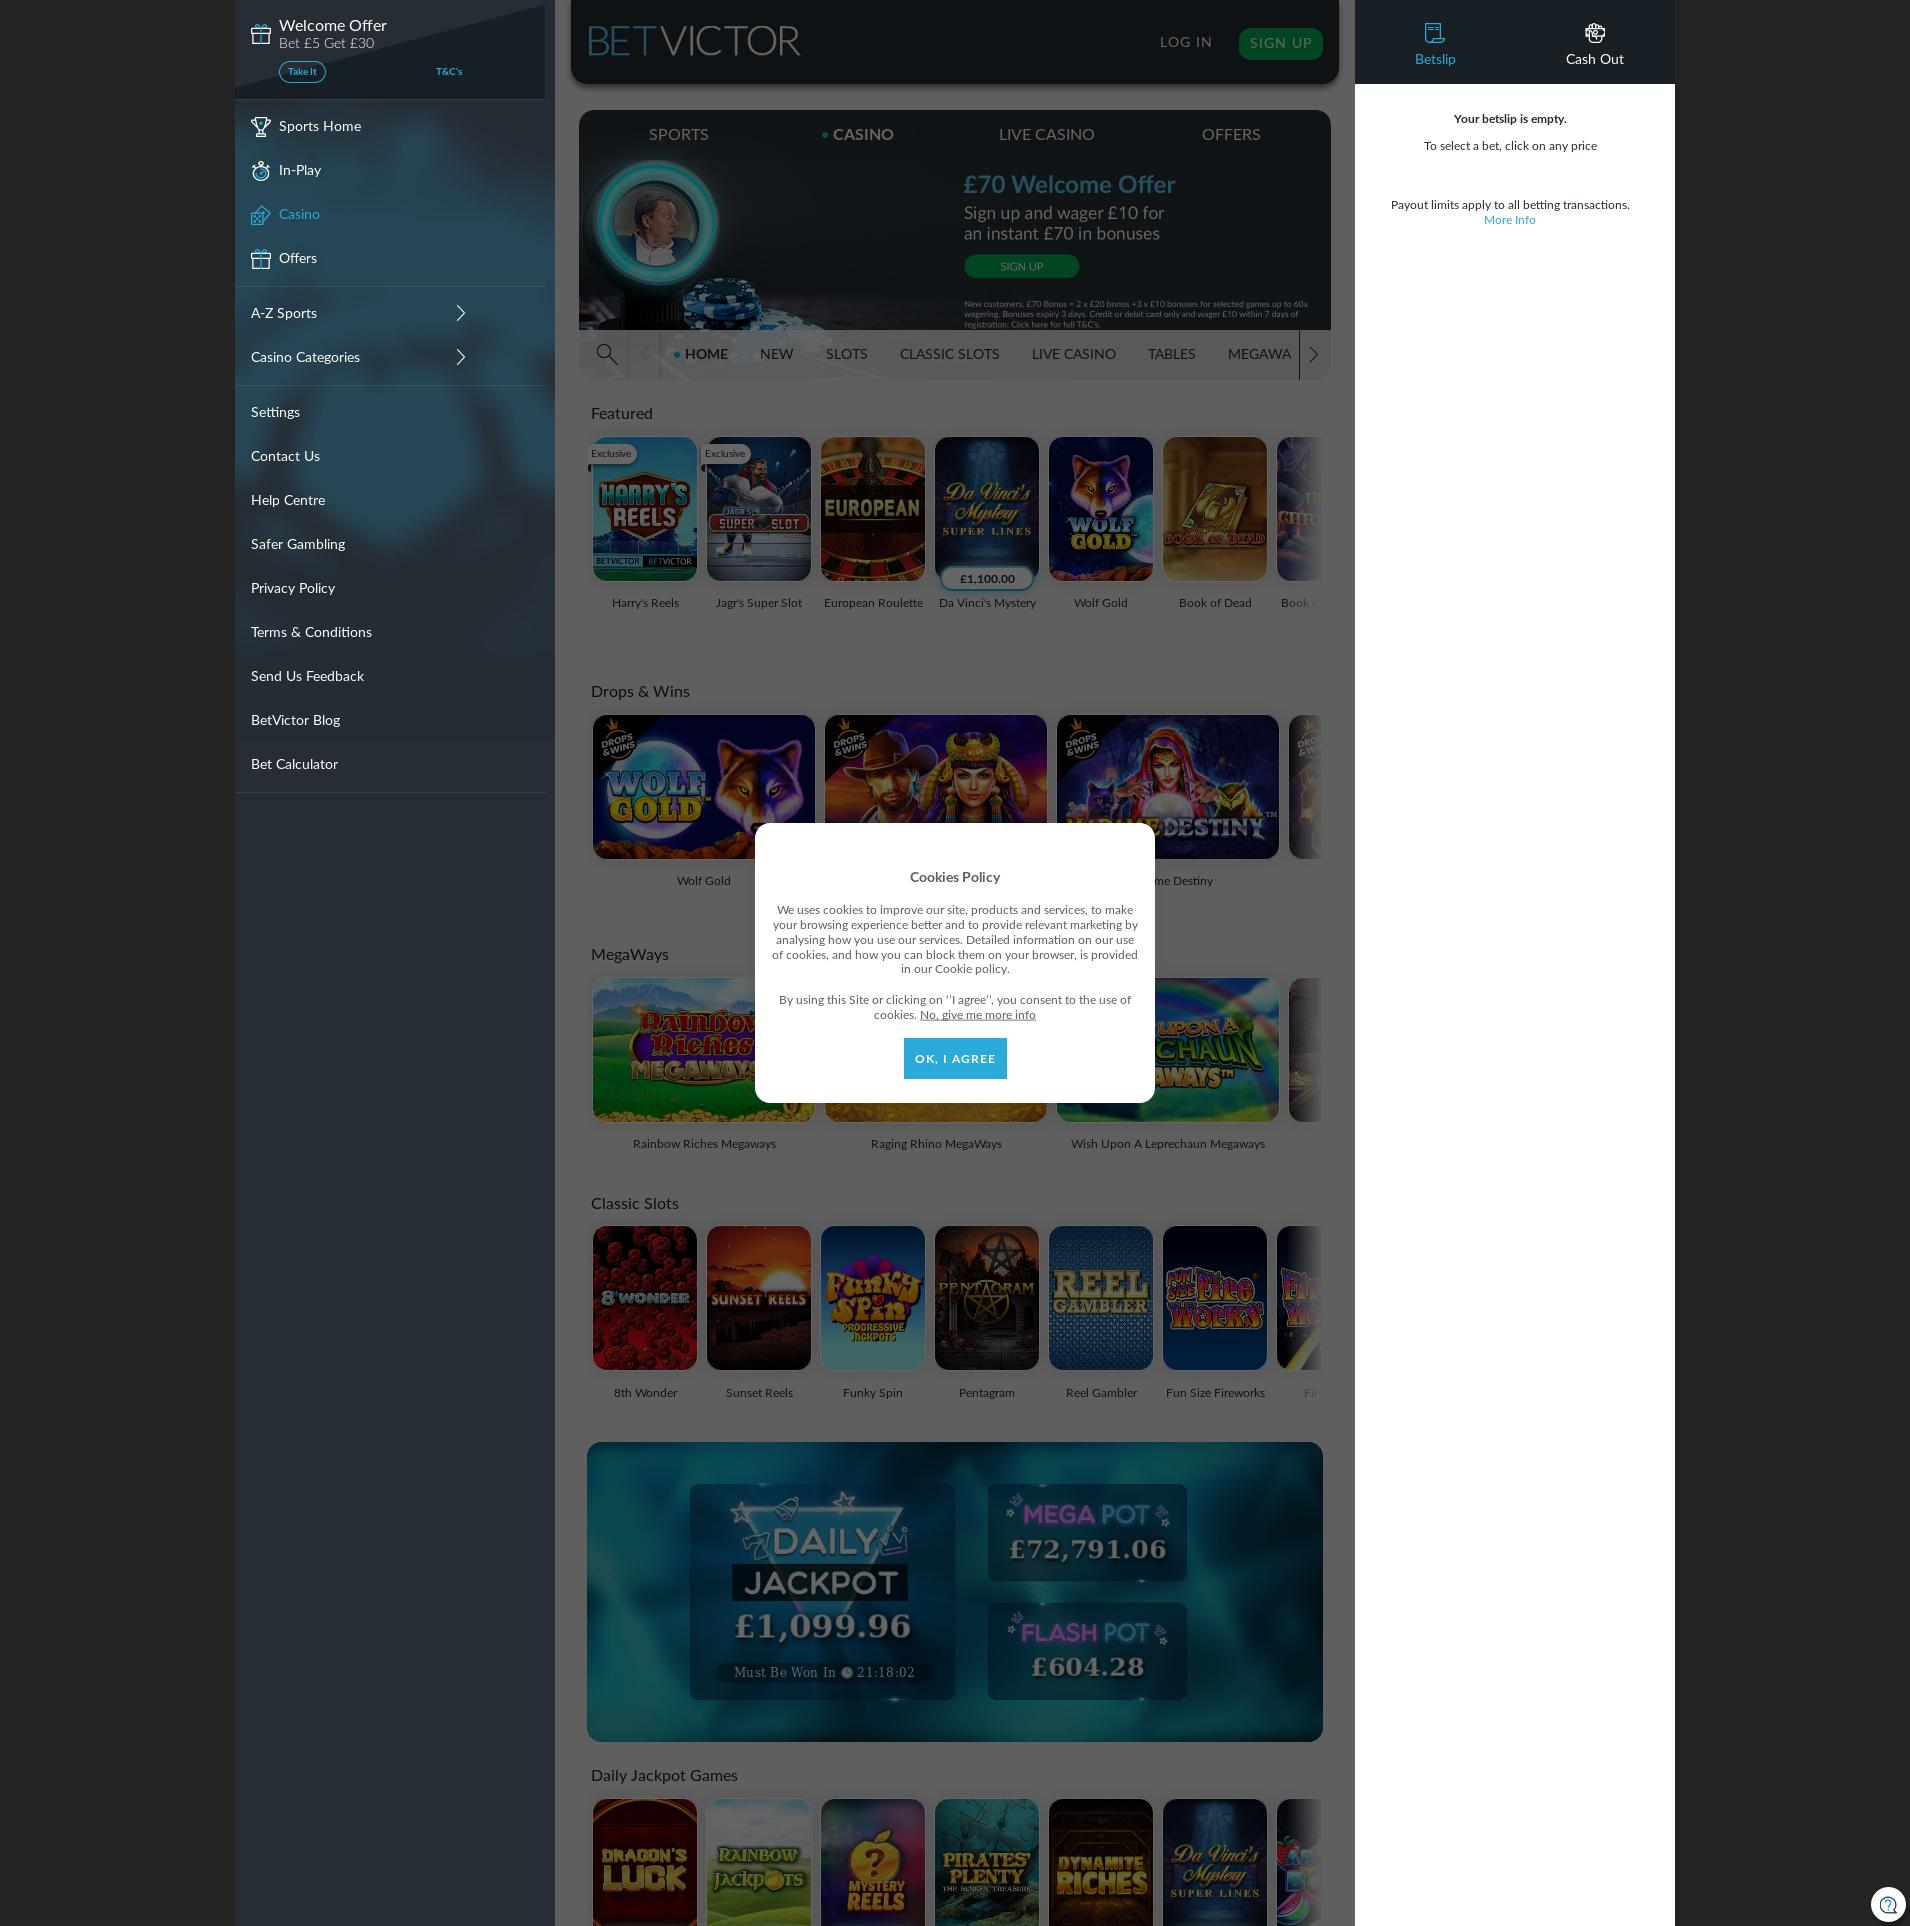 Casino screen Lobby 2019-11-22 for United Kingdom